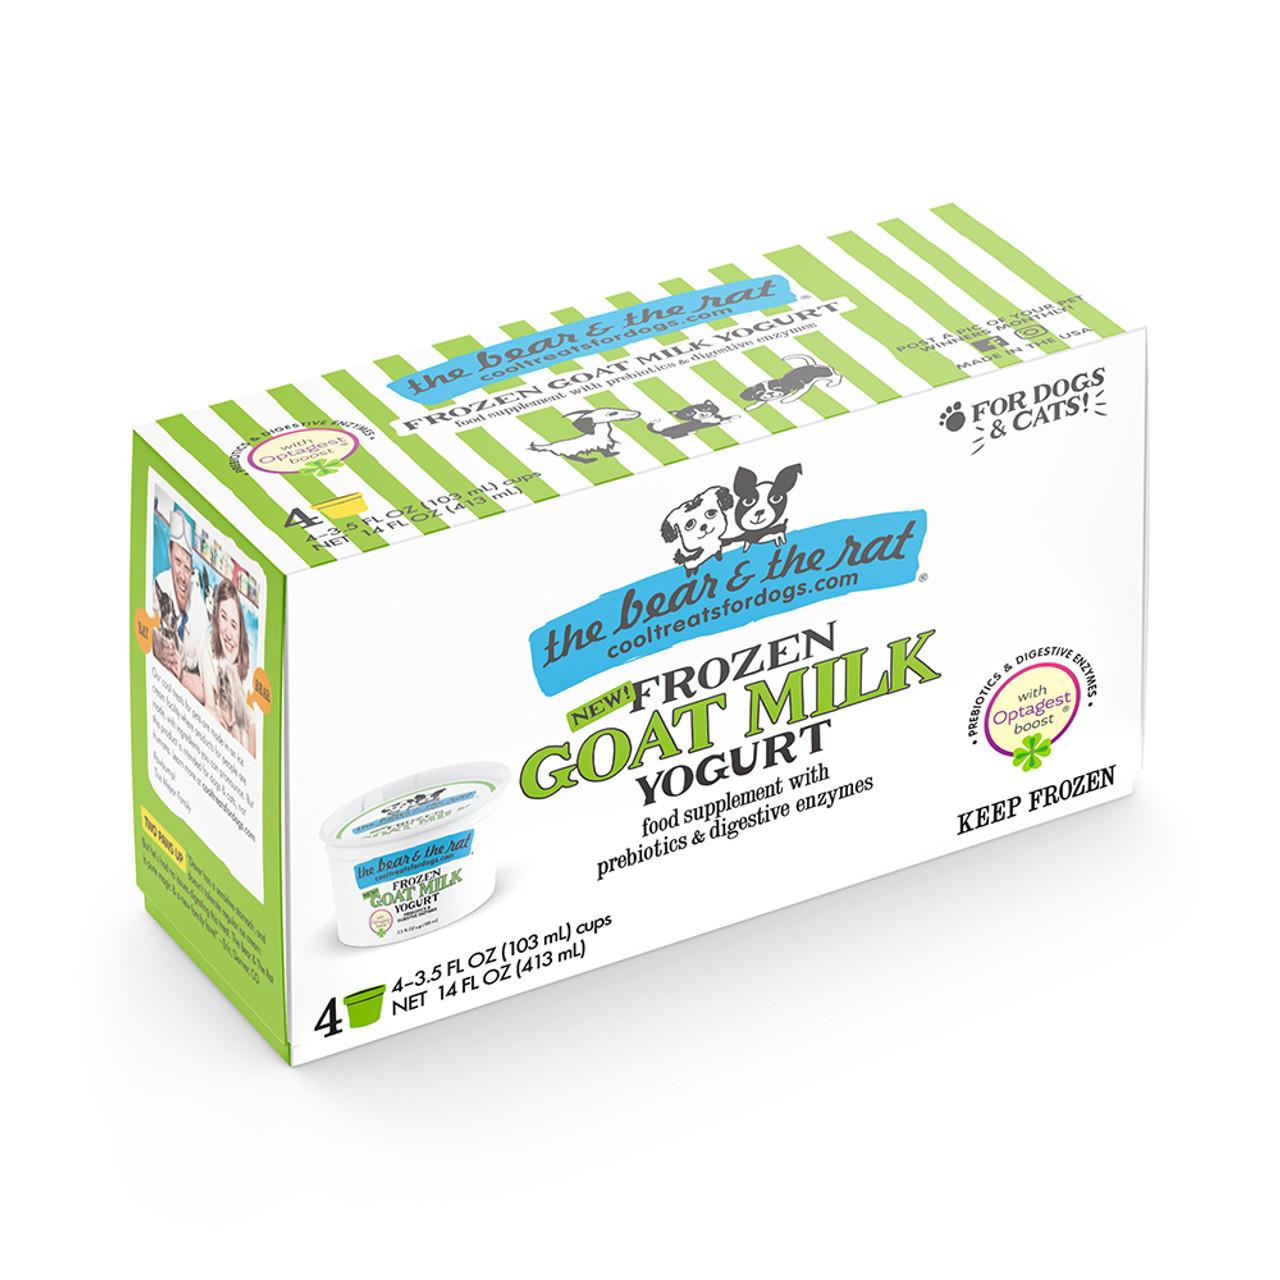 The Bear & The Rat Goat Milk Frozen Yogurt Cat & Dog Treats